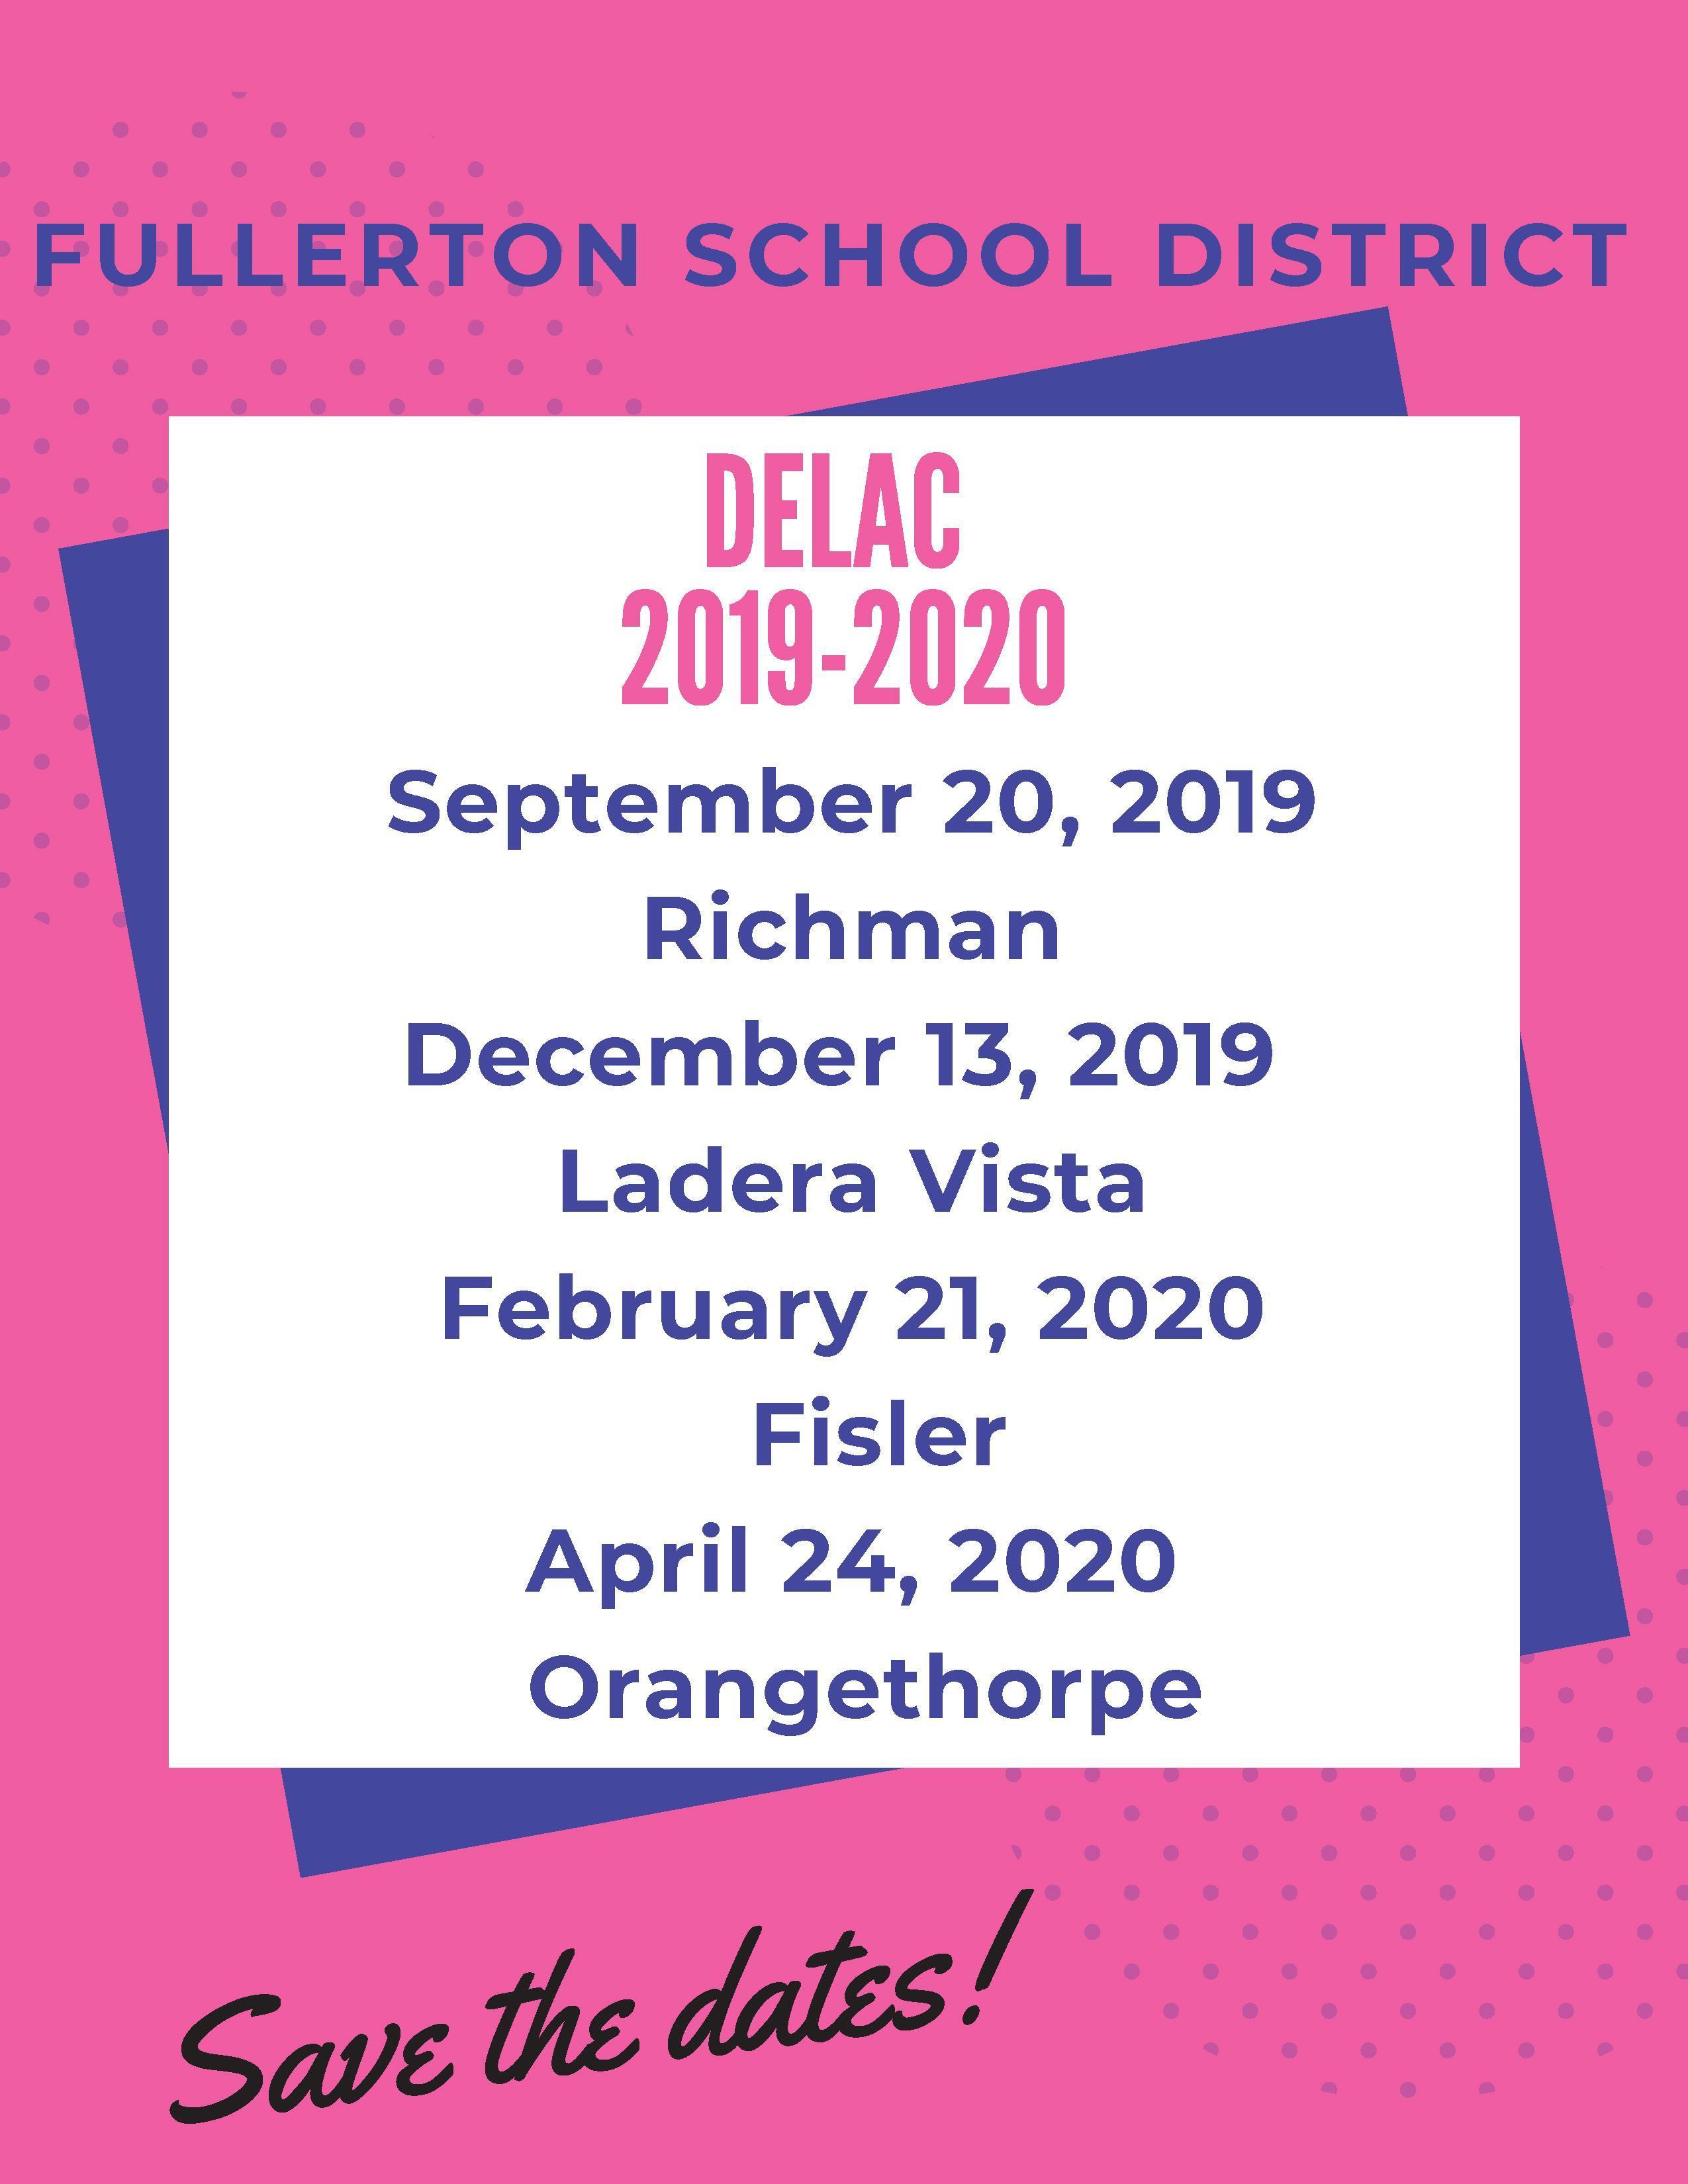 DELAC Dates 29-20 English Flyer